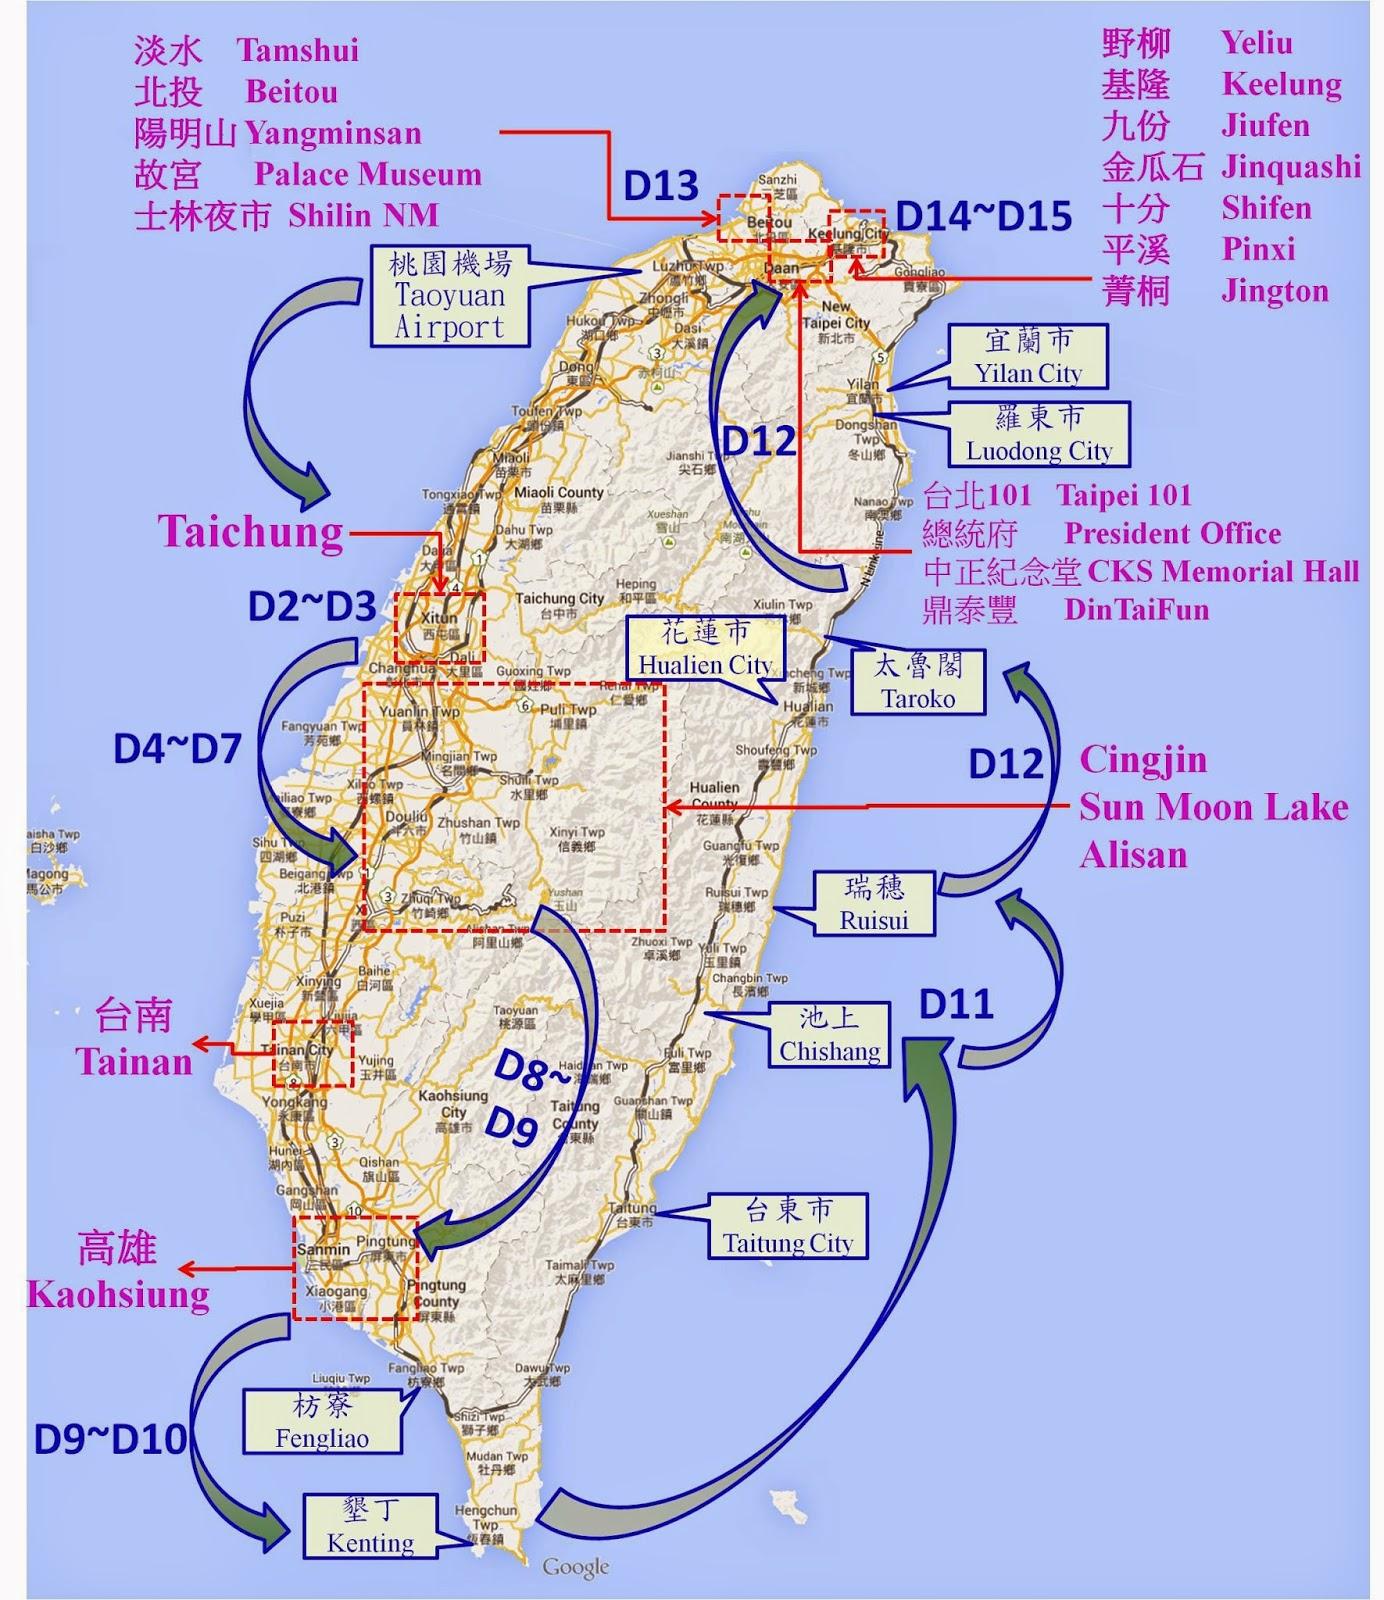 Taiwan itinerary examples travel taiwan 15 day round island itinerary sciox Choice Image